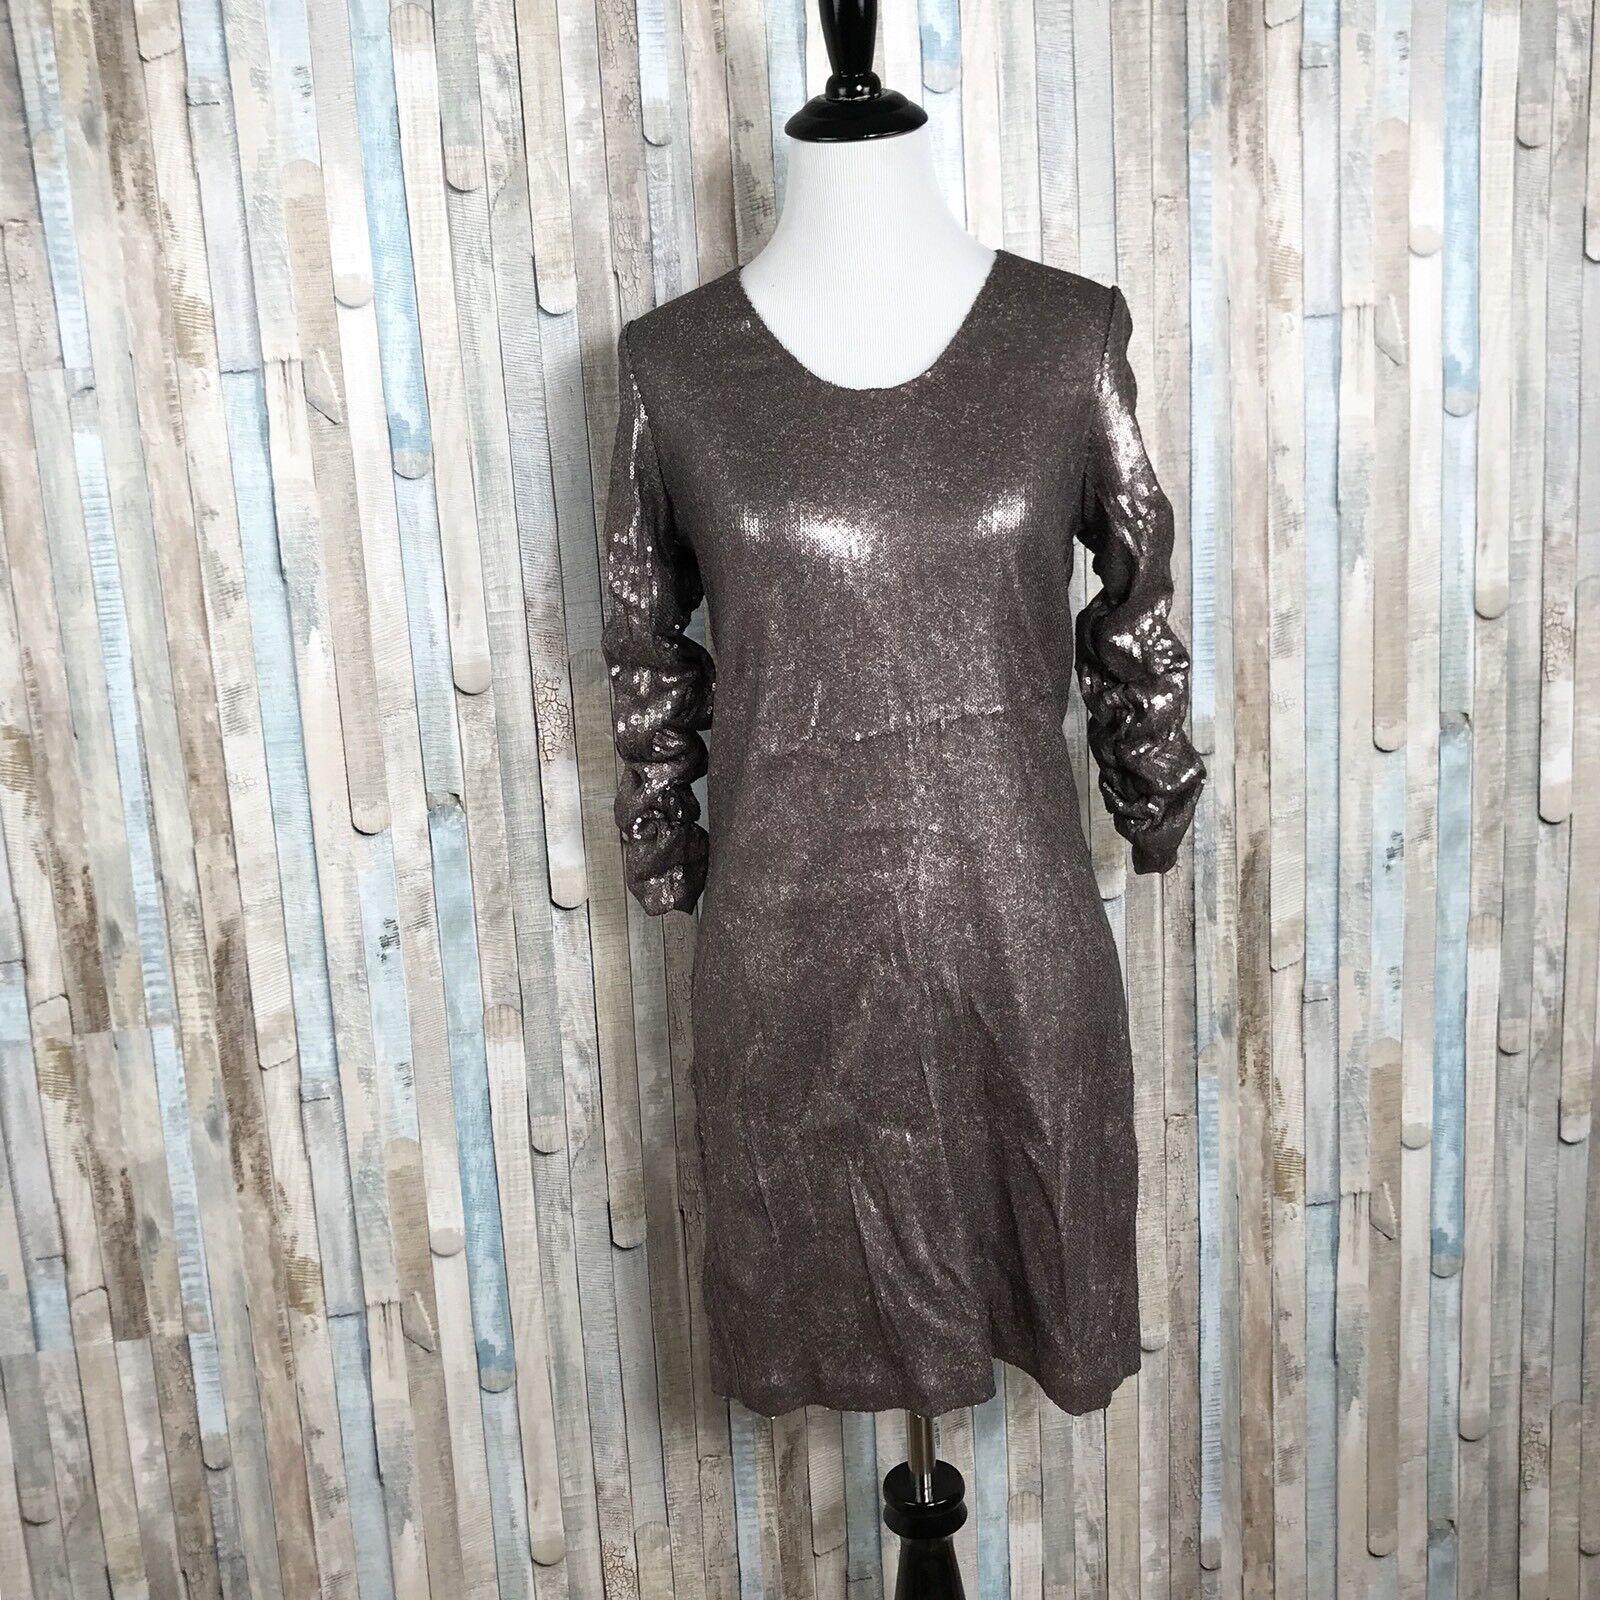 Badgley Mischka Mark James XS Metallic Bronze Sequin Cocktail Sheath Dress